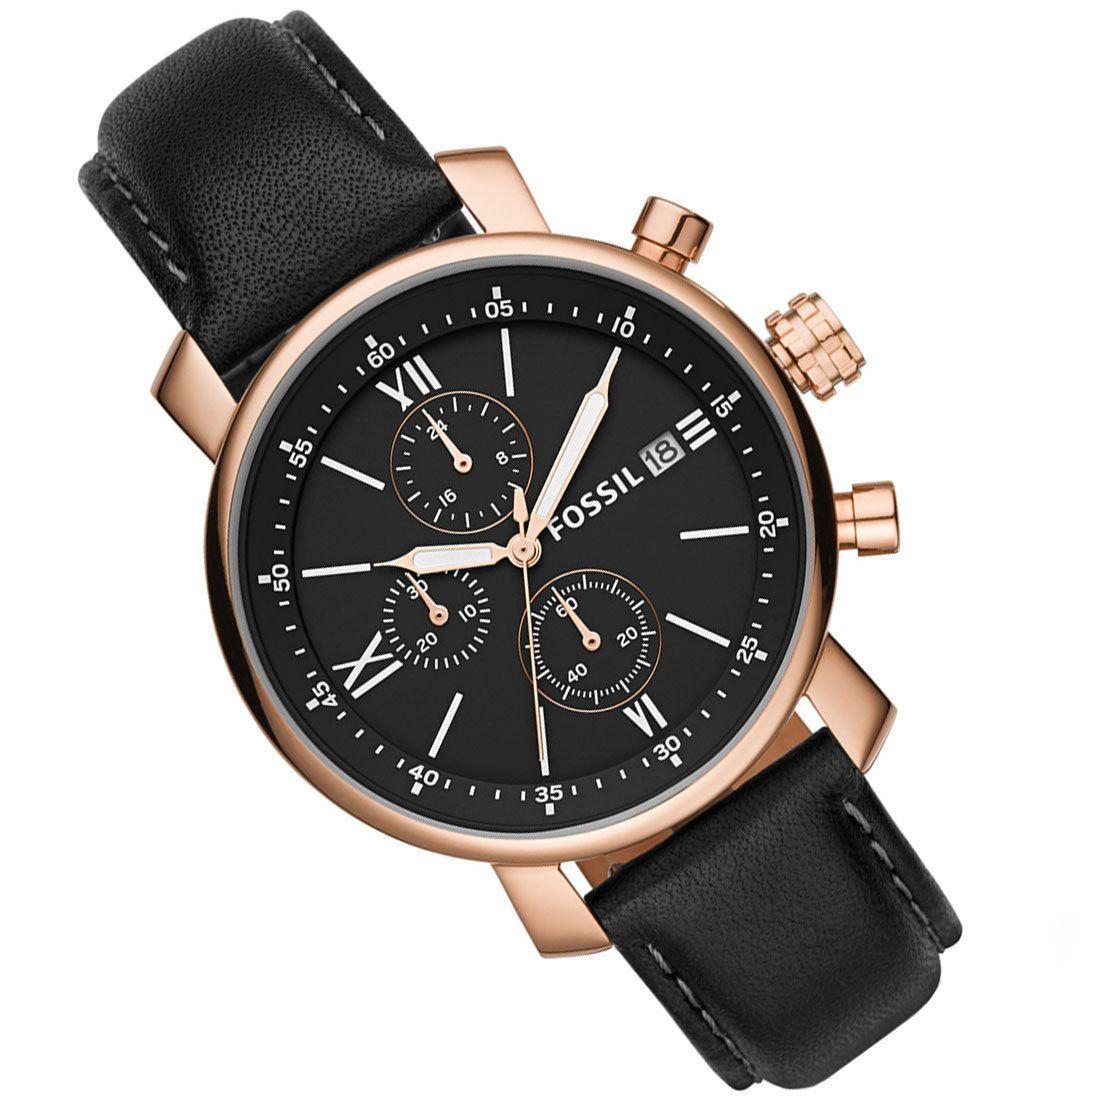 BQ1008 Fossil Rhett Chronograph Male Watch in 2020